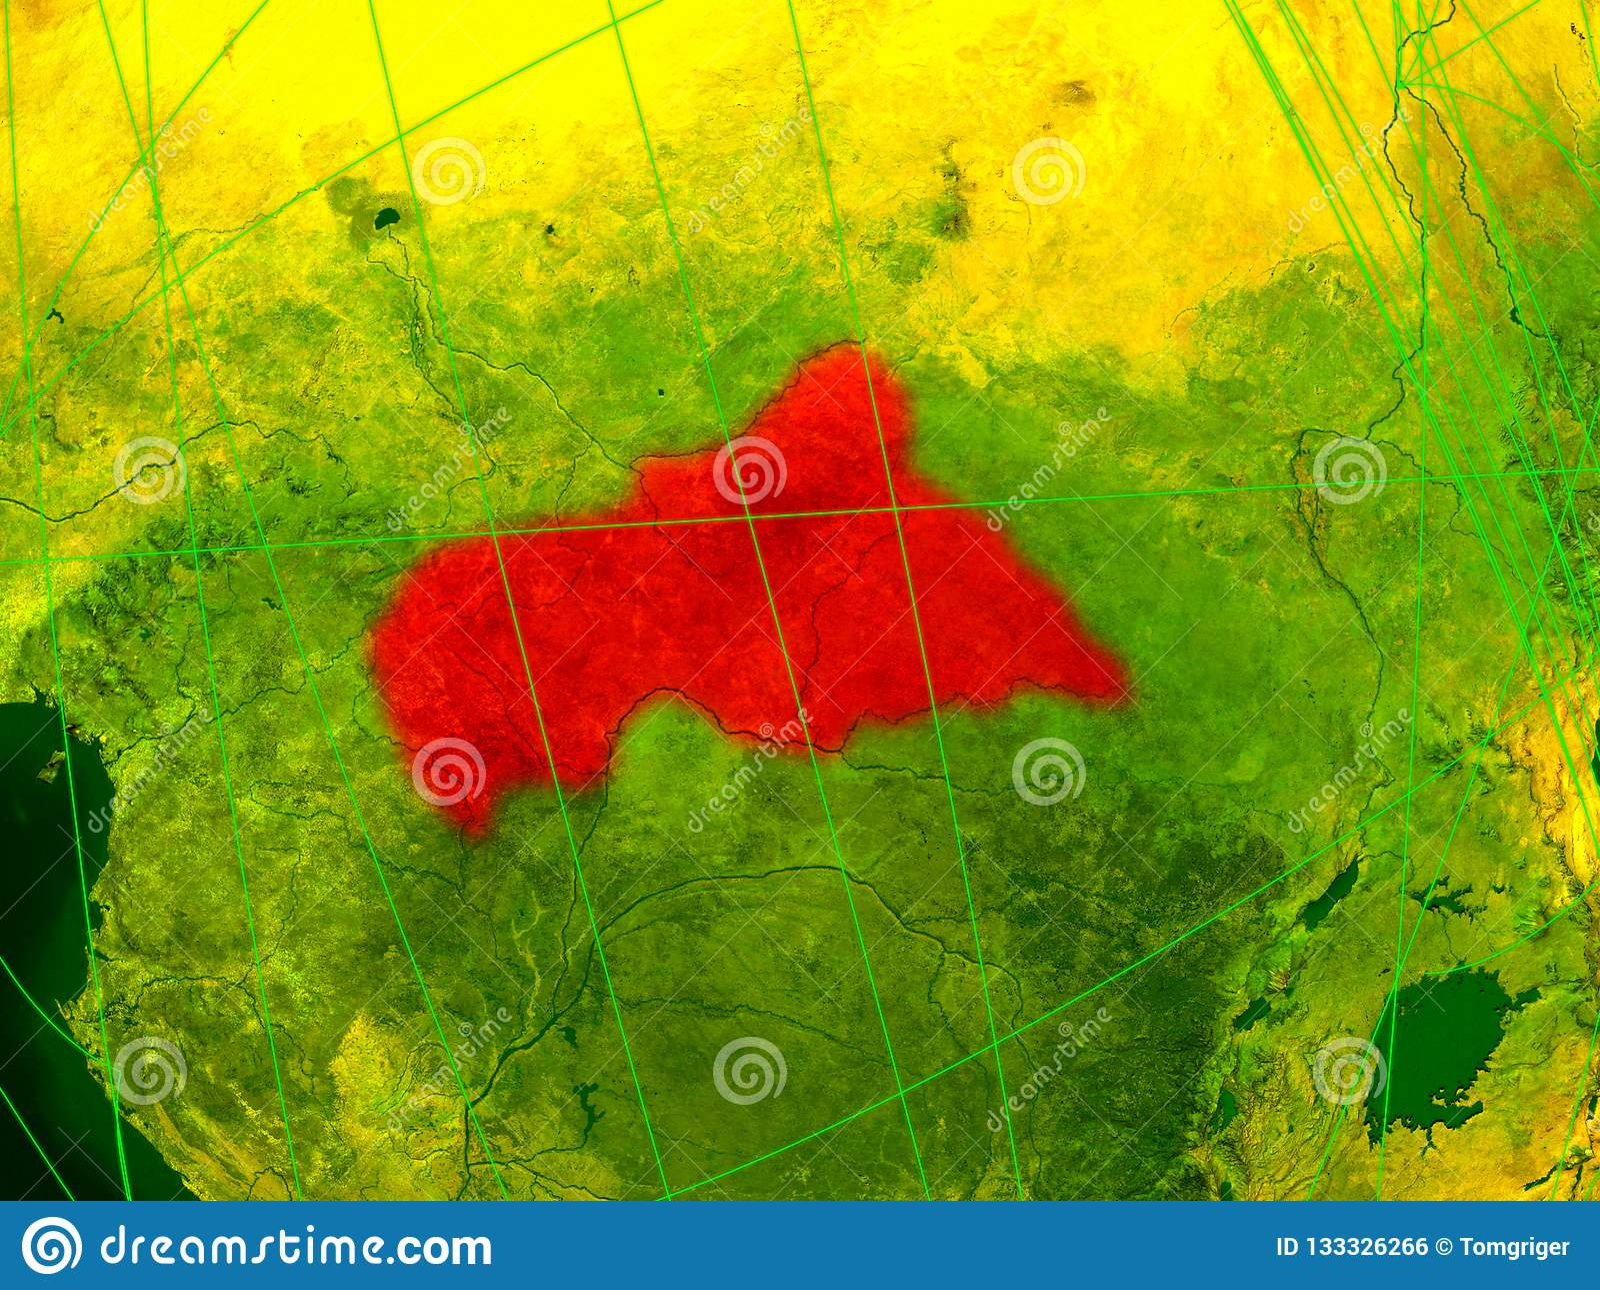 Central Africa On Digital Map Stock Illustration - Illustration of on